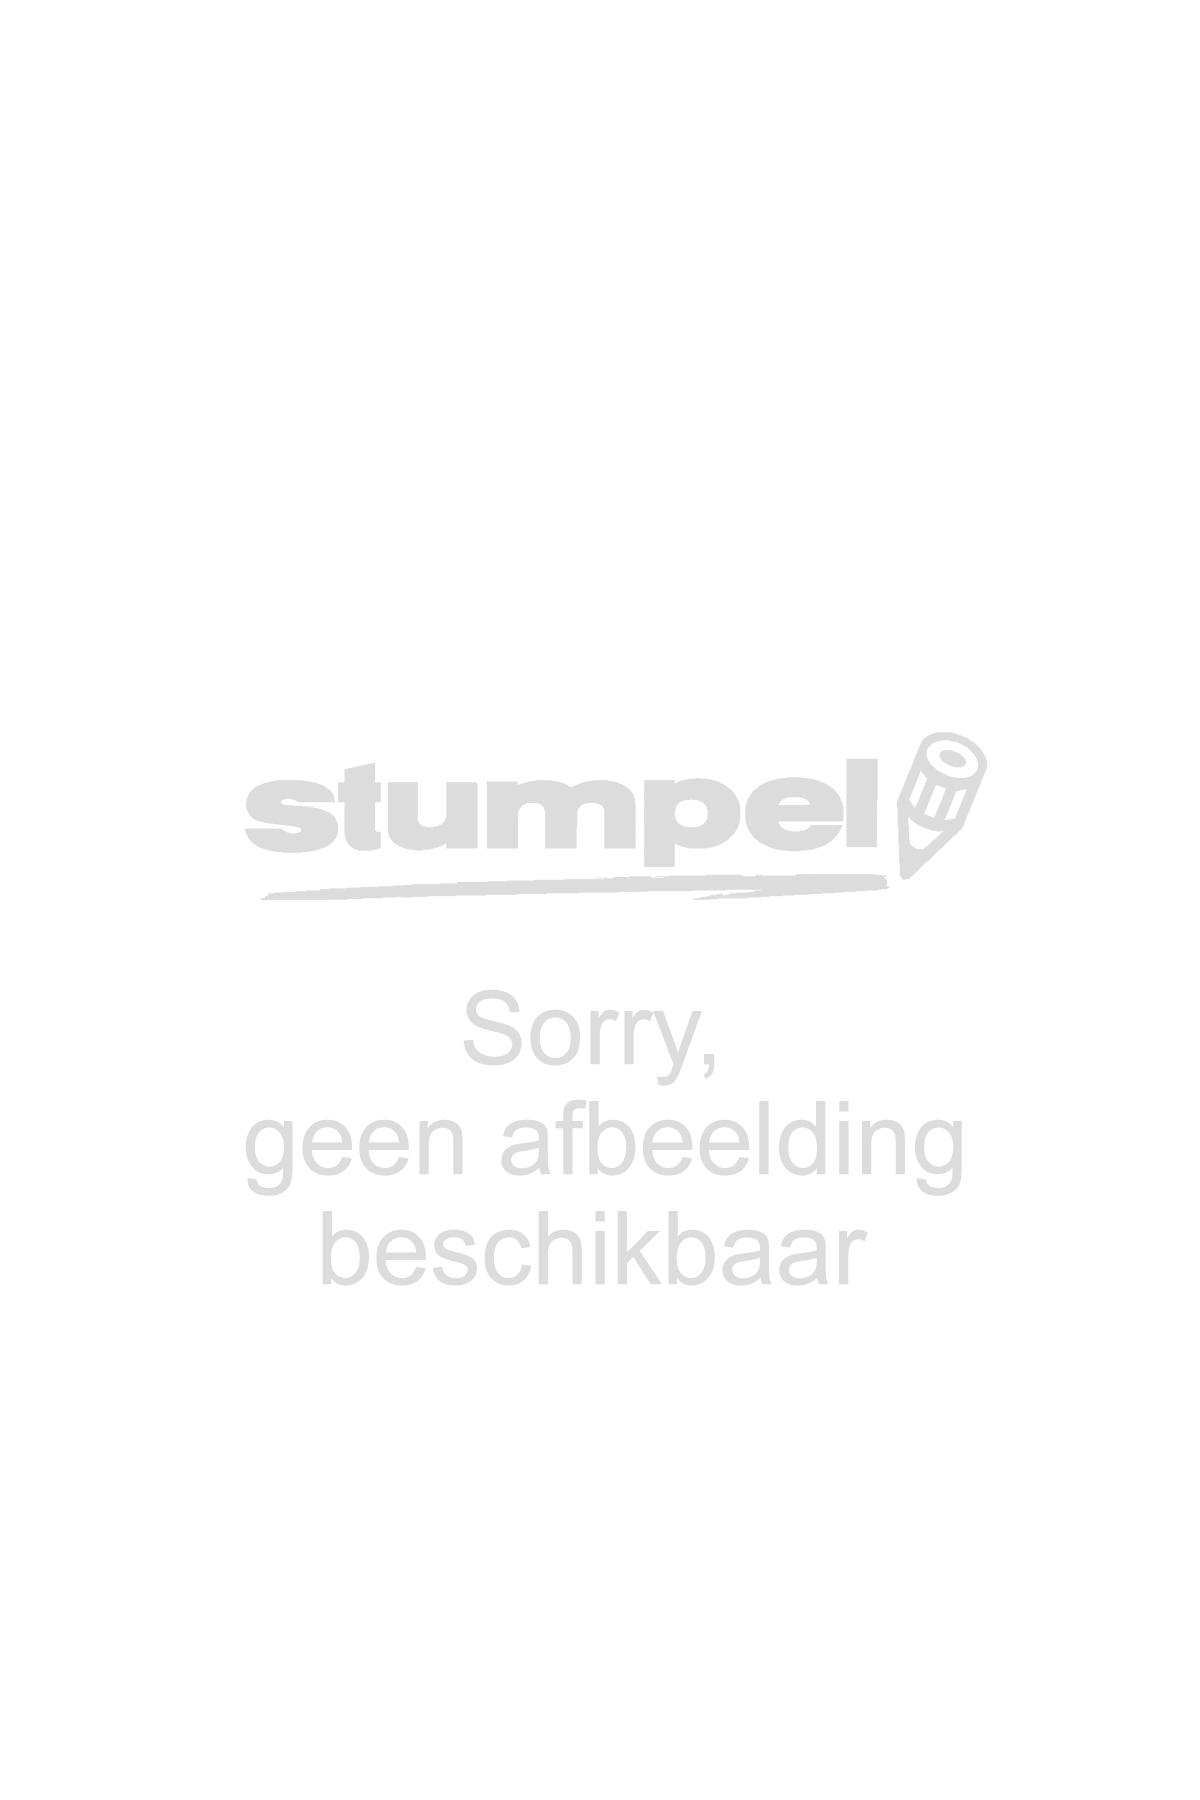 agenda-2021-ryam-memoplan-7-staand-wire-o-wit-nl-eco-zwart-11010990